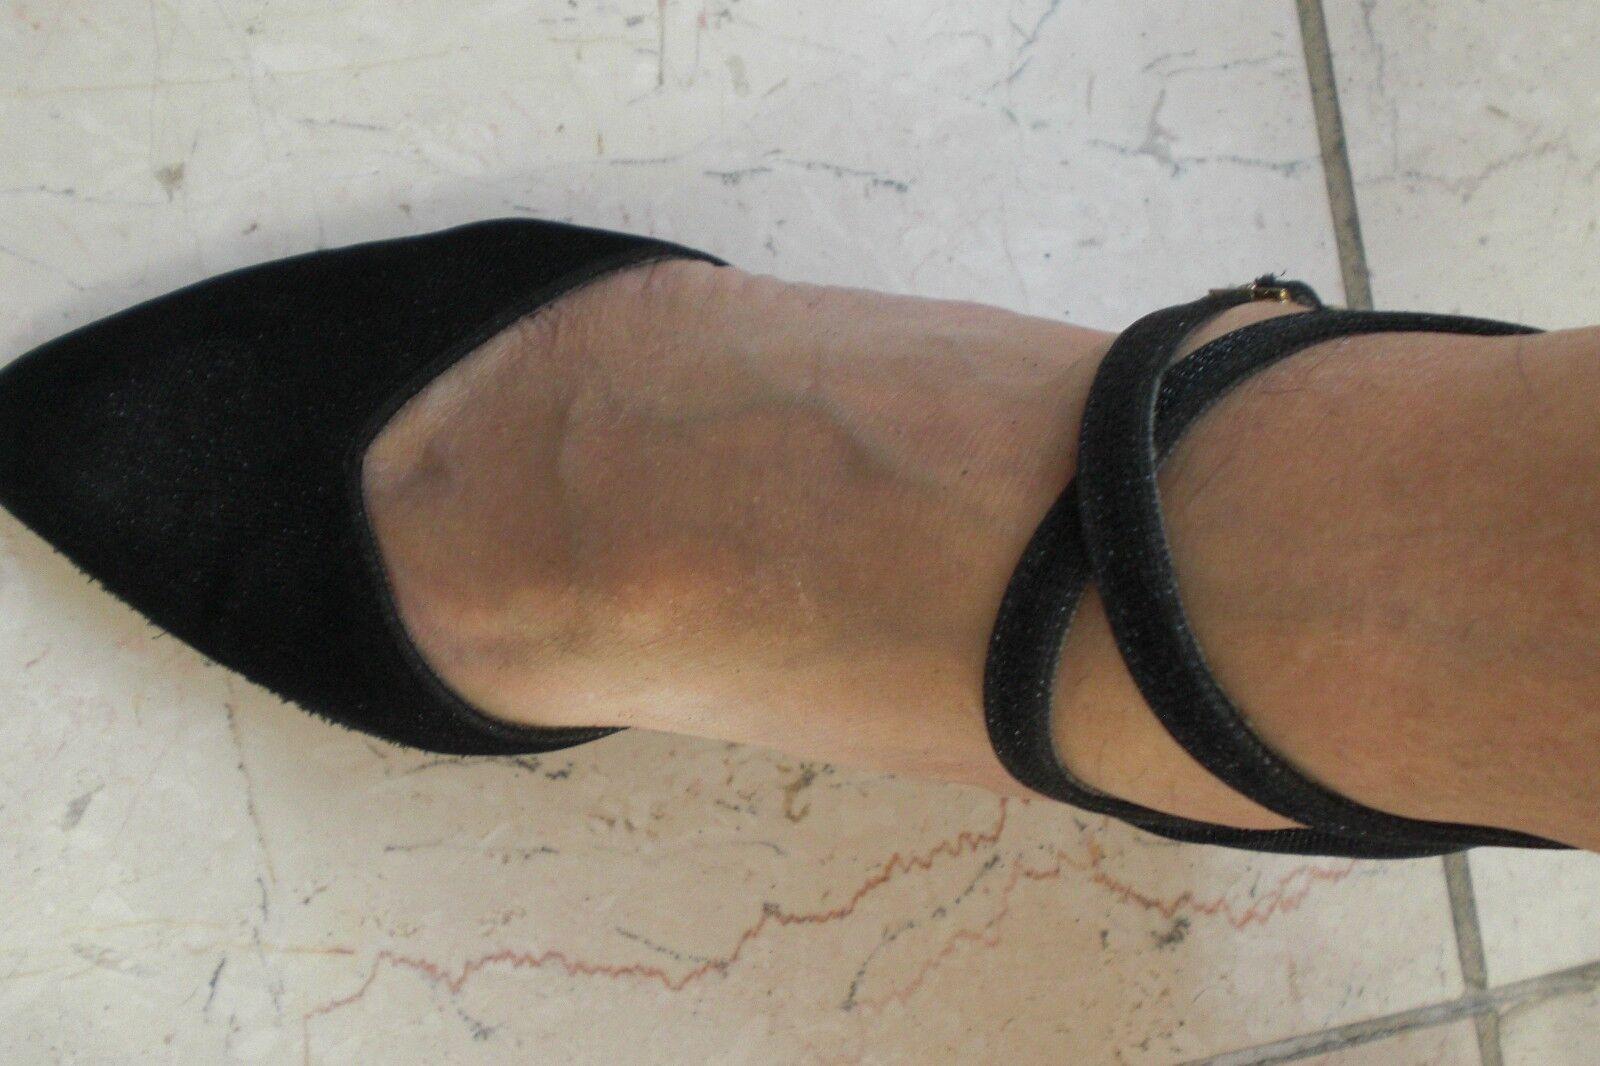 INTERNATIONAL DANCE SHOES SHOES SHOES LADIES Damen schwarz Peeptoe Lurex black size 3,5 ce9973